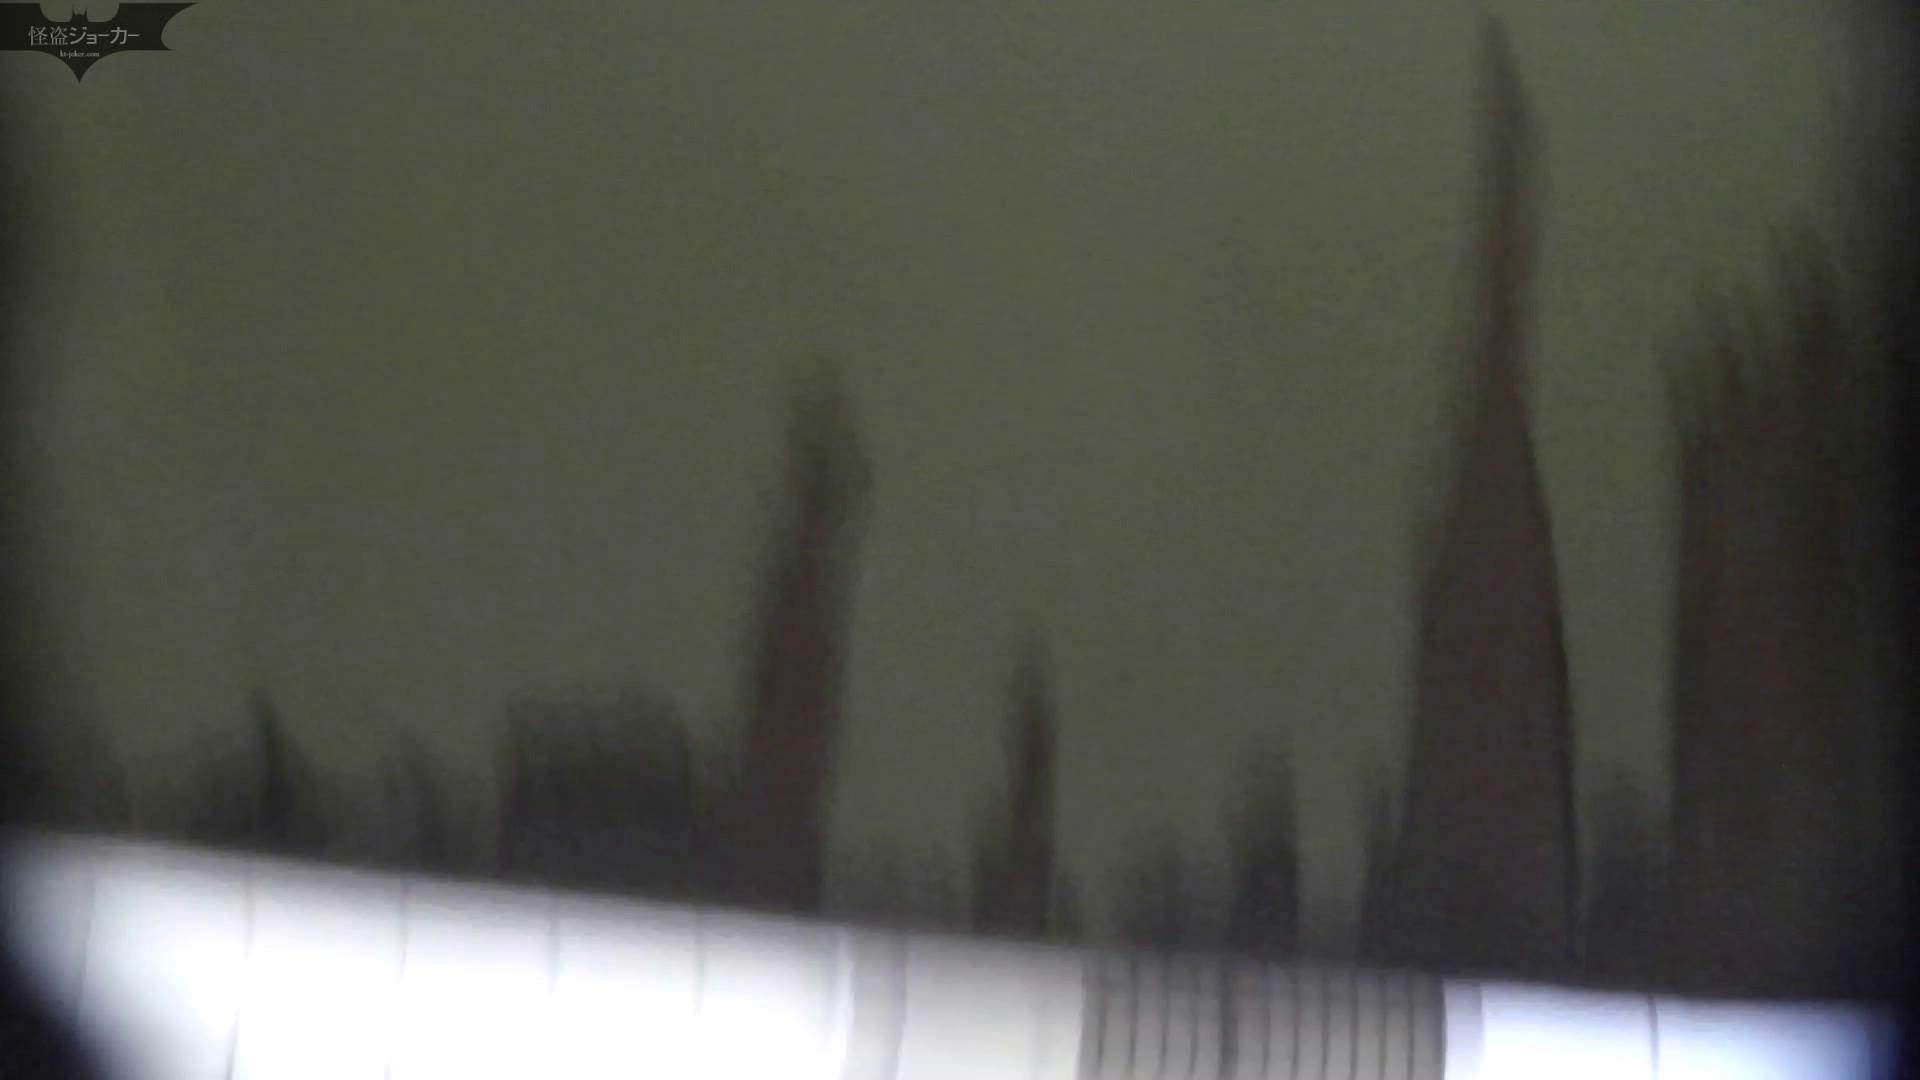 無修正エロ動画|洗面所特攻隊 vol.050 特攻無毛地帯!!|怪盗ジョーカー